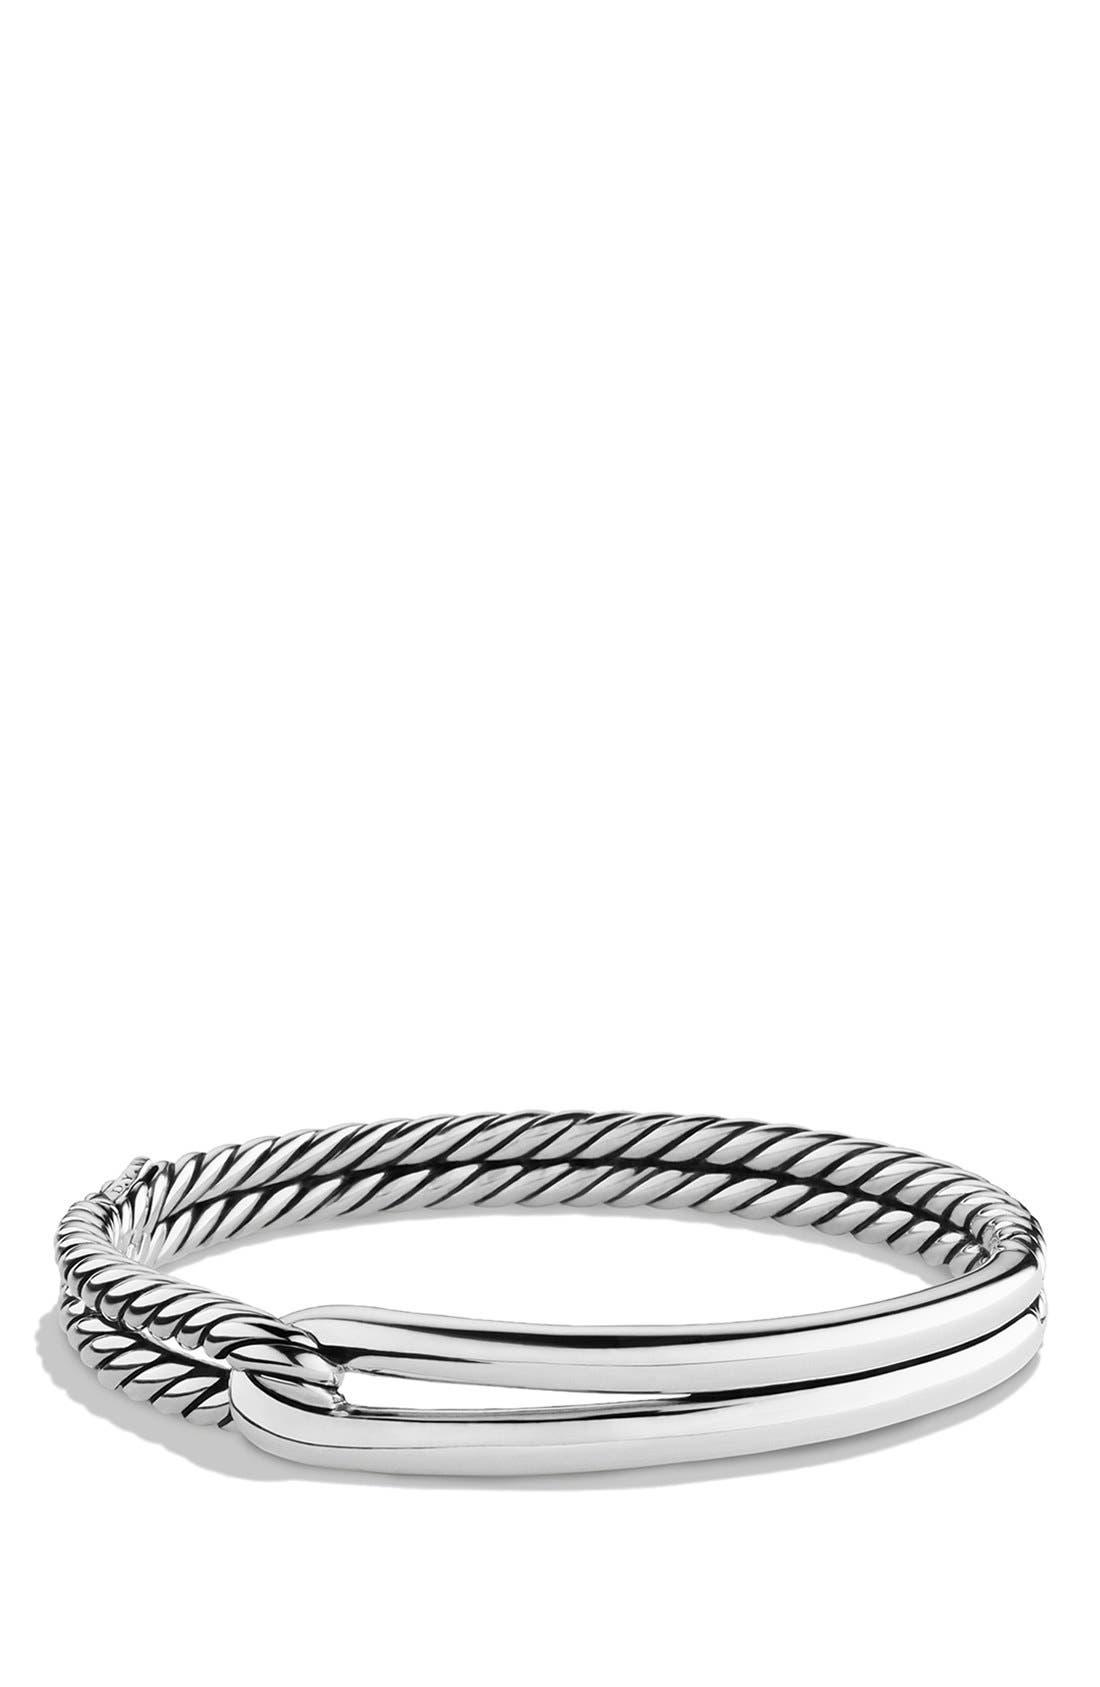 'Labyrinth' Single Loop Bracelet,                             Main thumbnail 1, color,                             SILVER